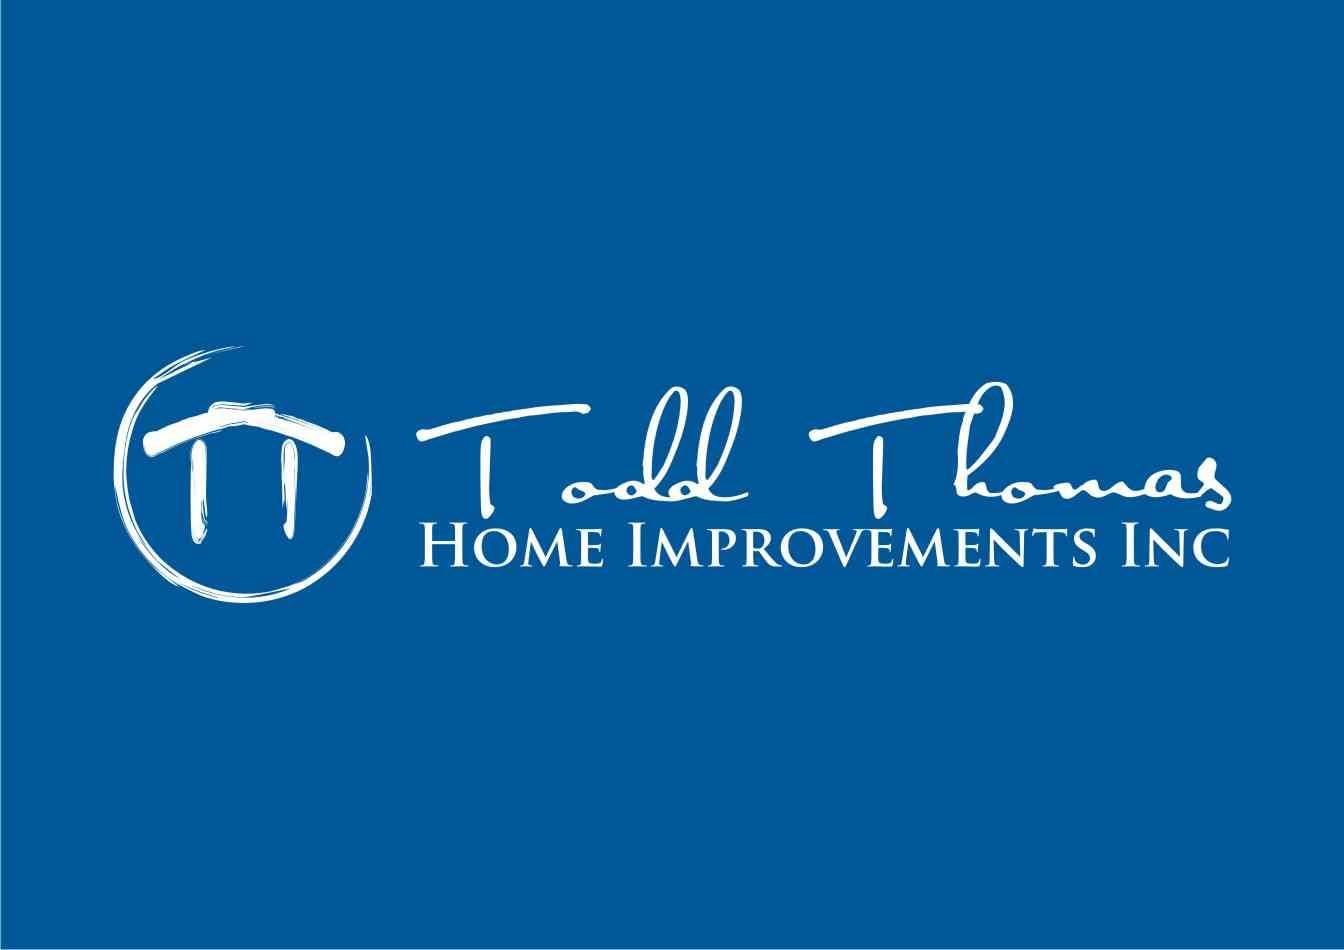 Todd Thomas Home Improvements Inc logo